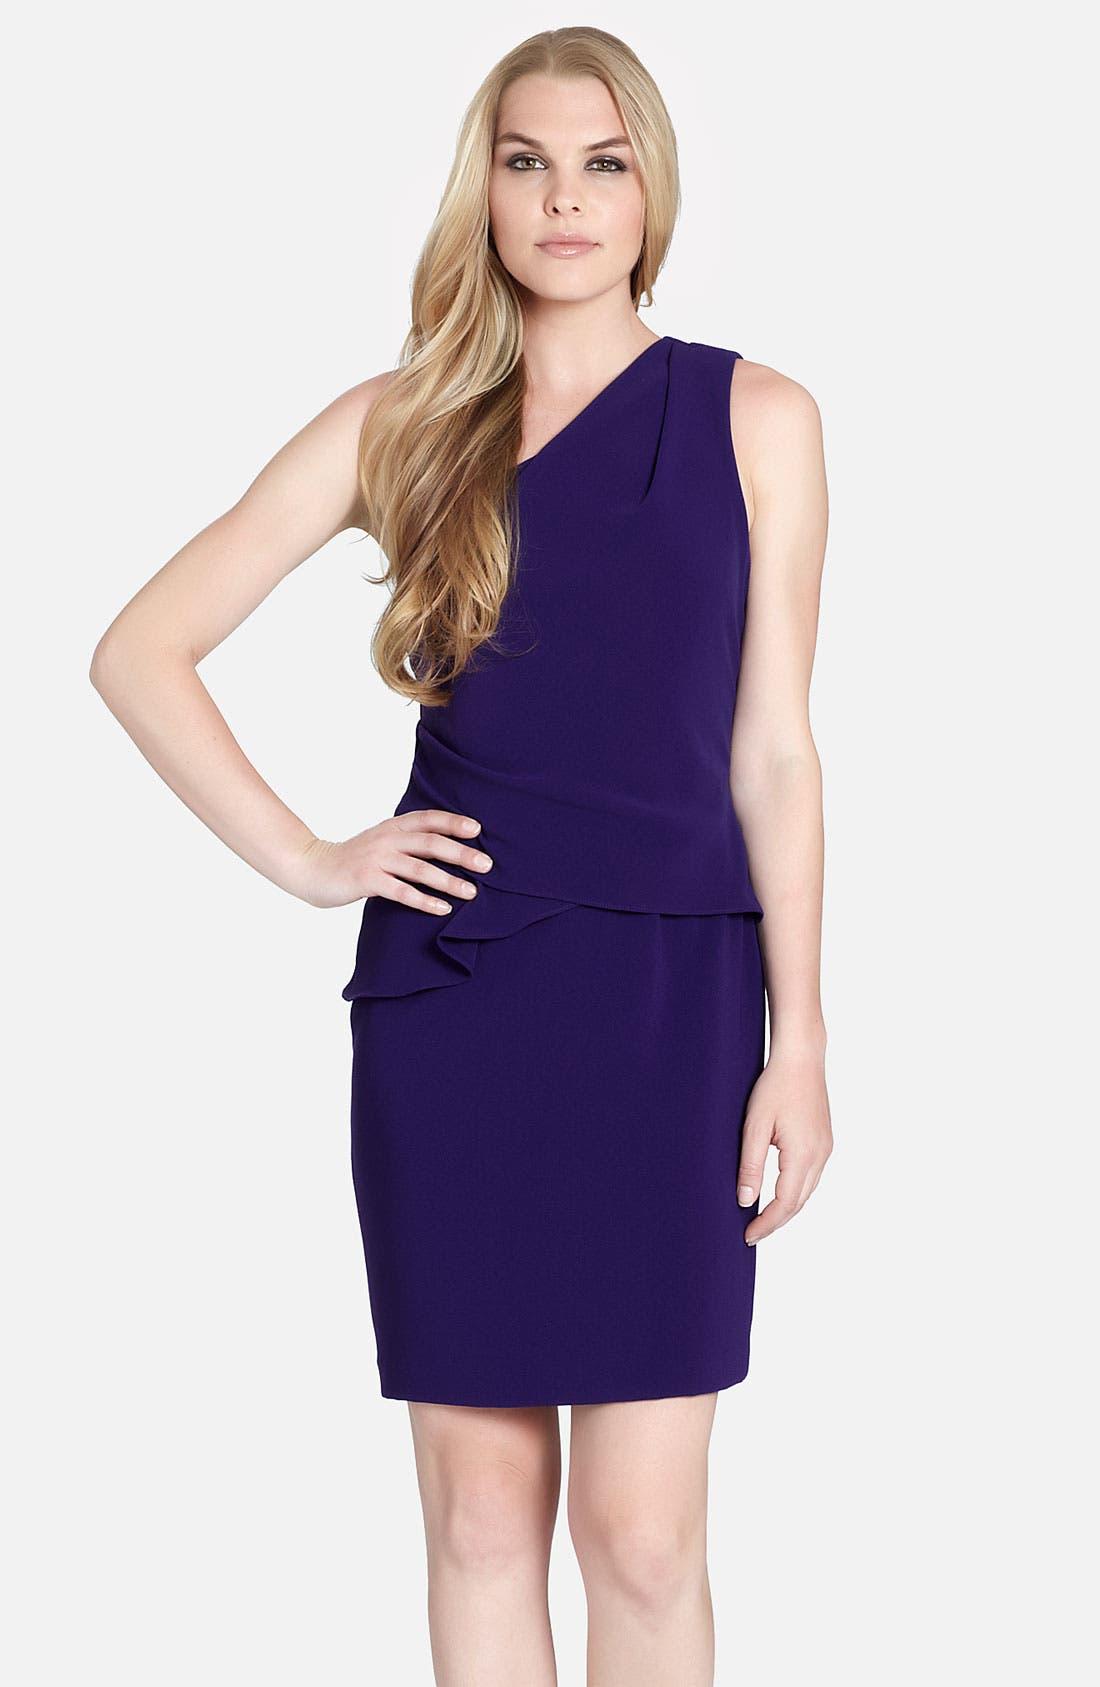 Main Image - Cynthia Steffe 'Brielle' One Shoulder Side Peplum Dress